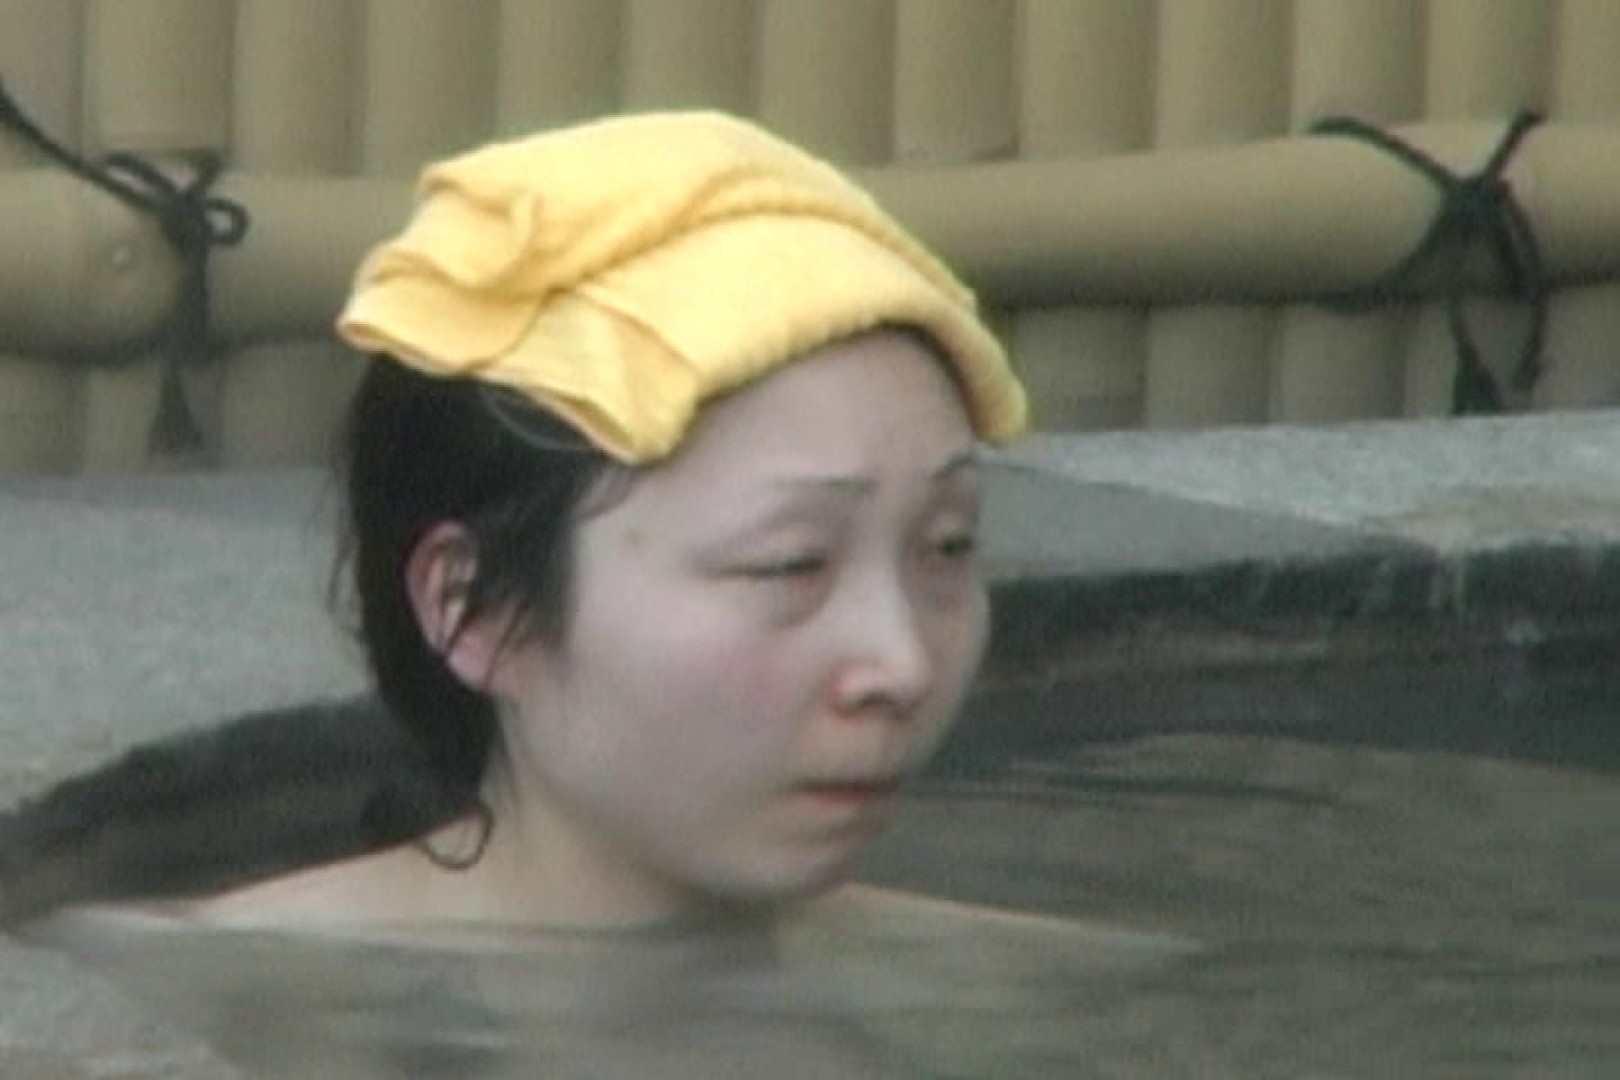 Aquaな露天風呂Vol.596 盗撮シリーズ | 露天風呂編  113PIX 51